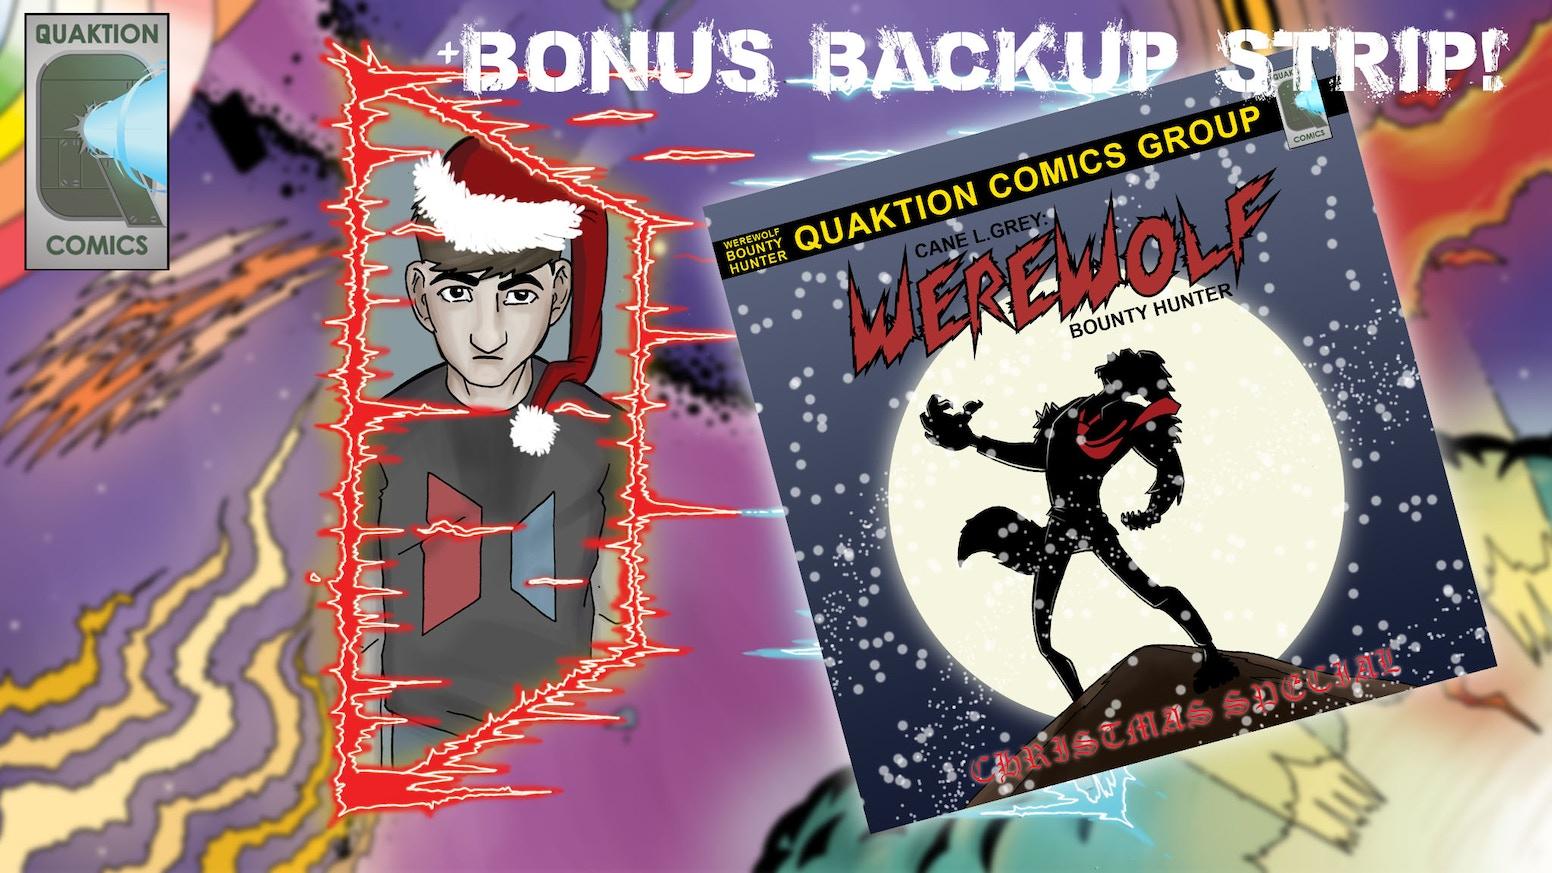 A regular boy, exploring irregular quantum universes - NOW FEATURING - Cane. L. Grey: Werewolf Bounty Hunter debut Backup Strip